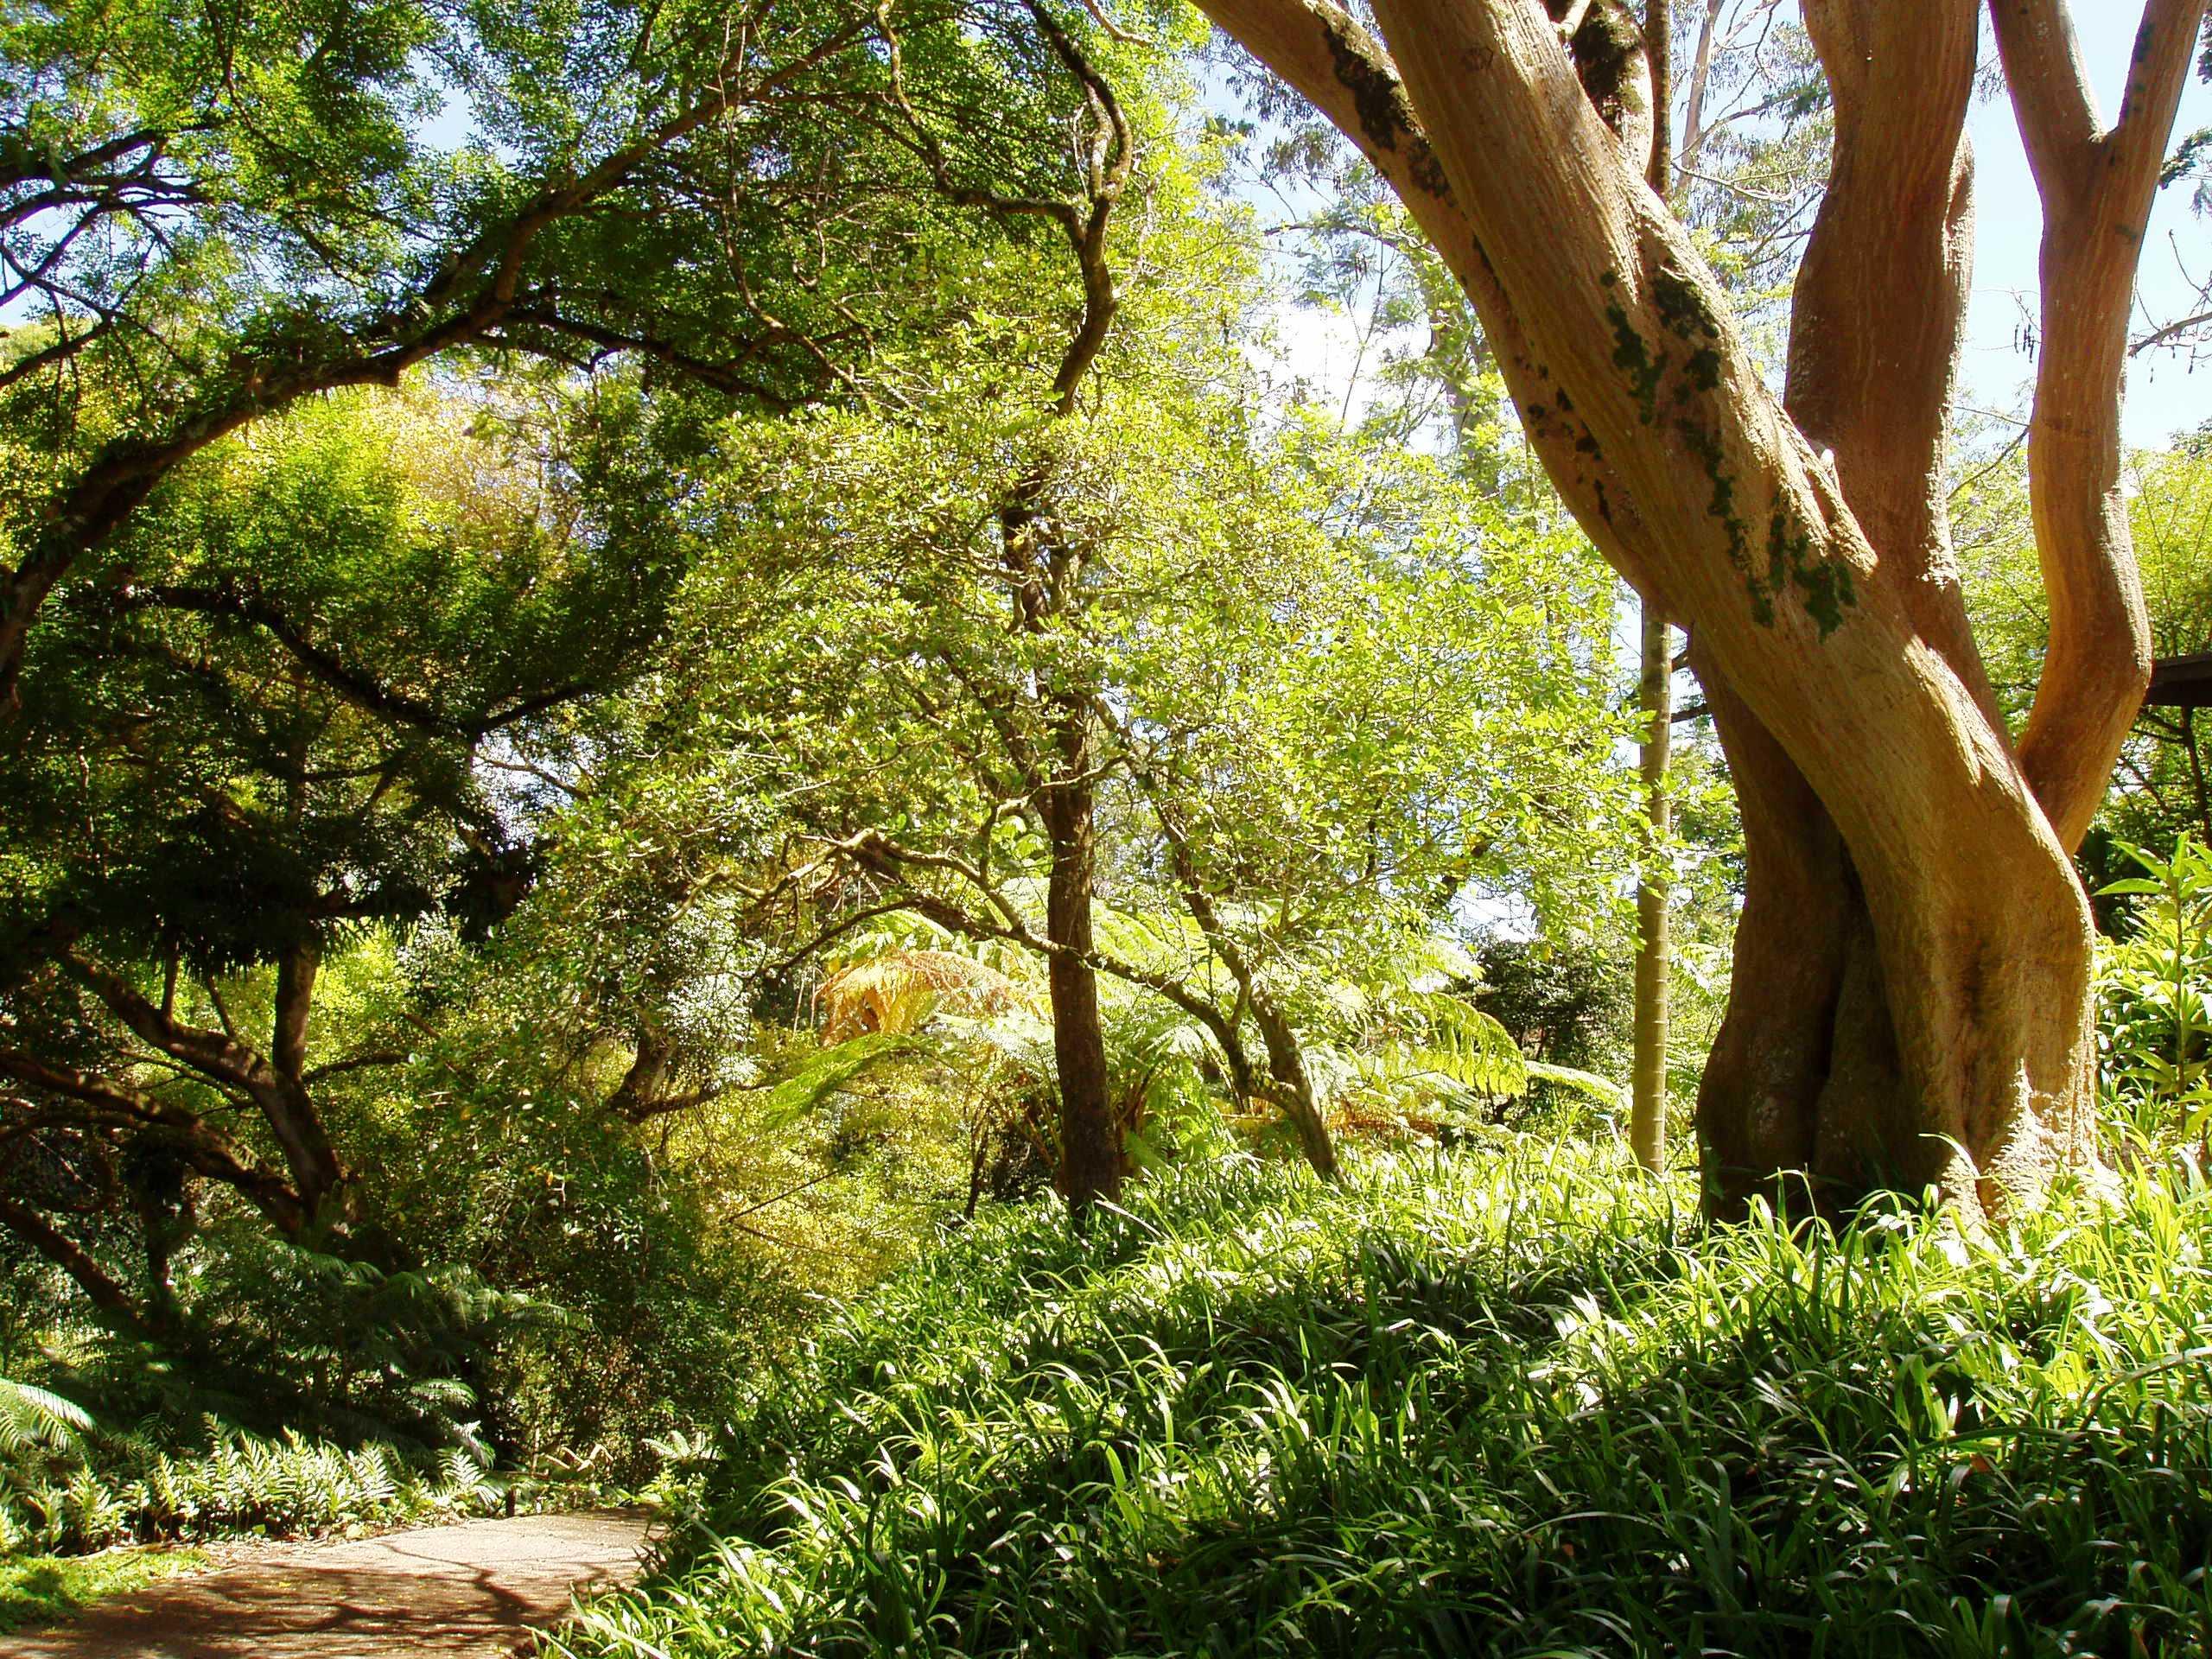 File:Wahiawa Botanical Garden - shady park view.JPG ...